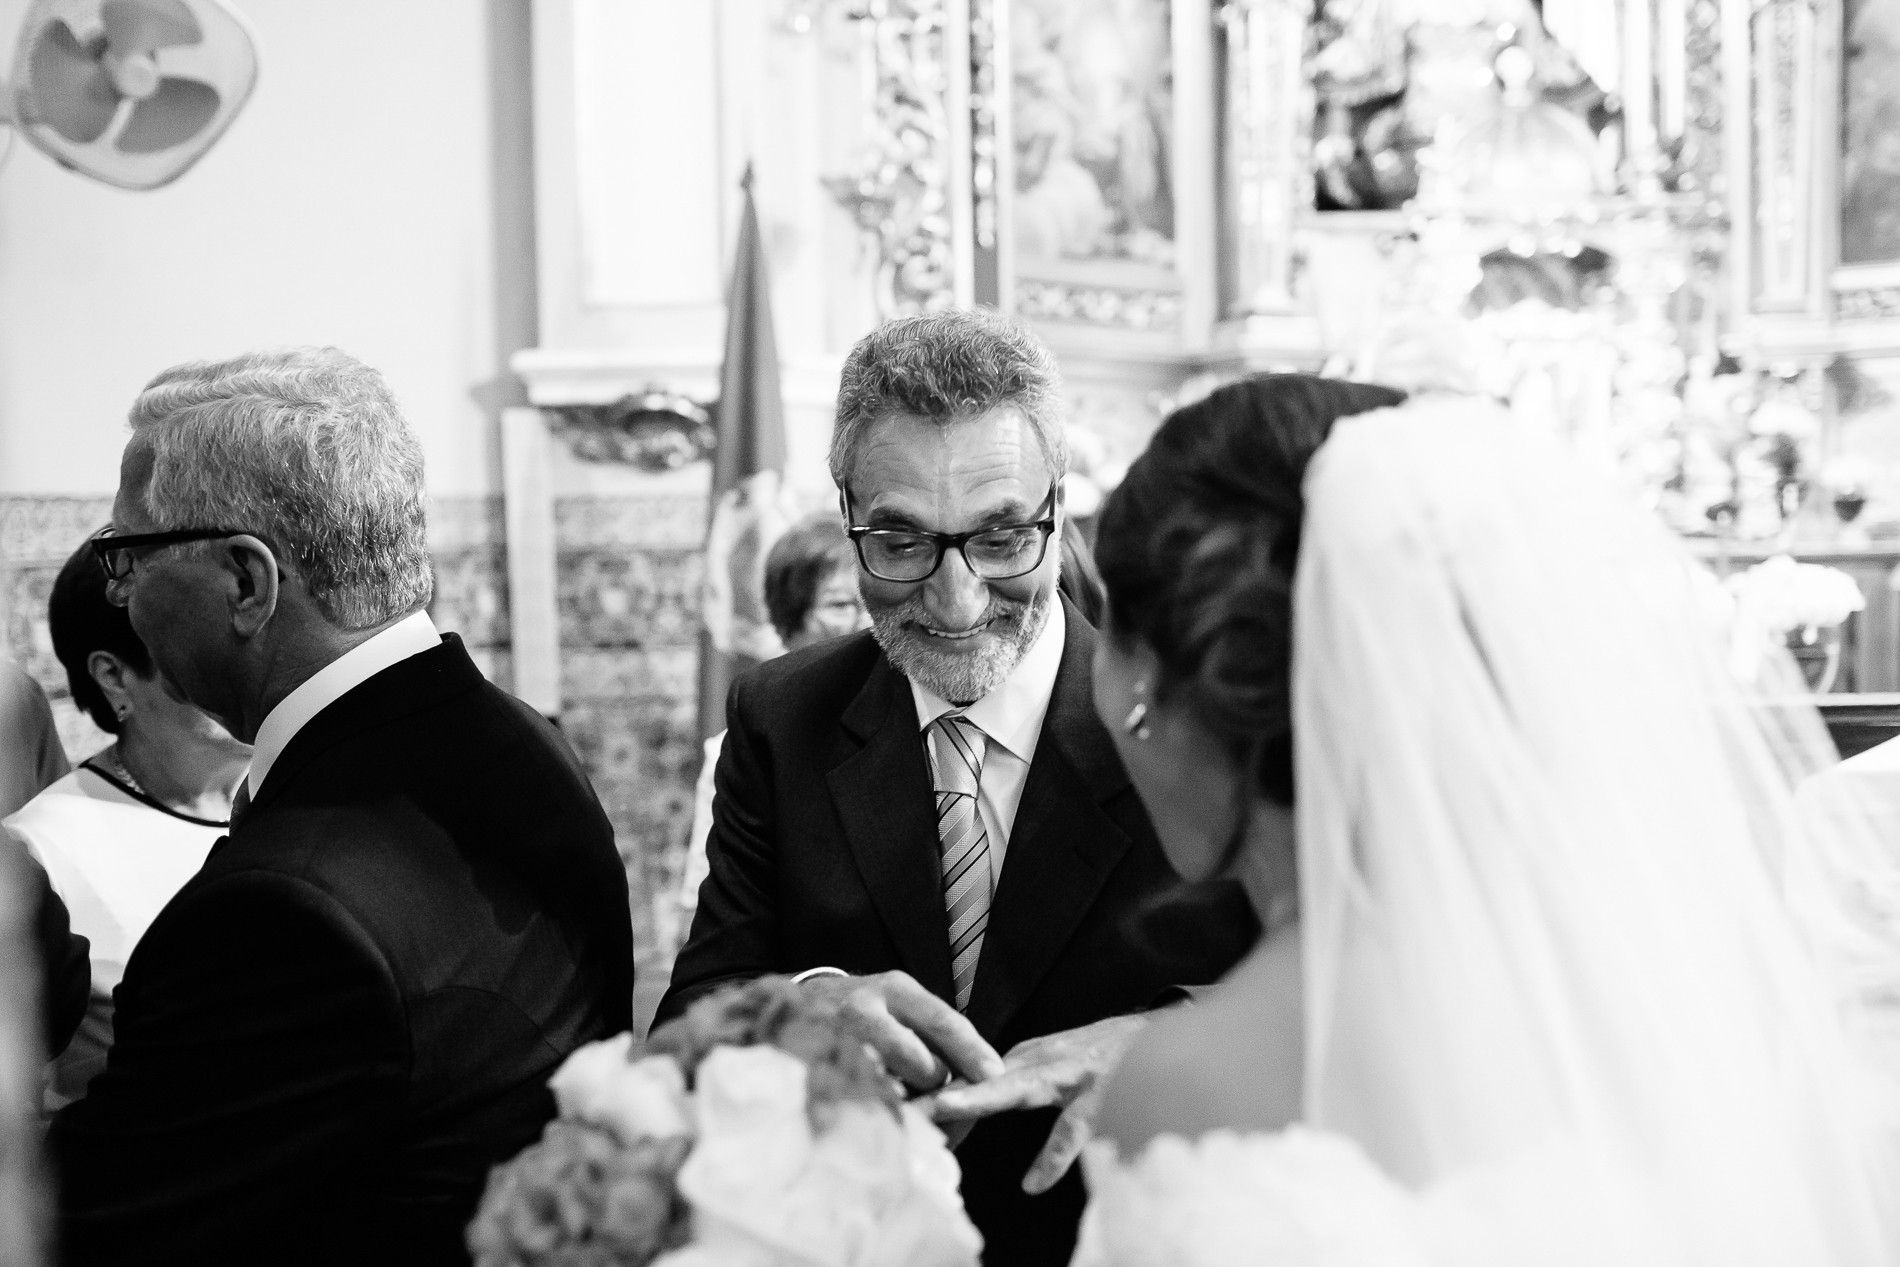 fotografo-de-boda-plasencia-21